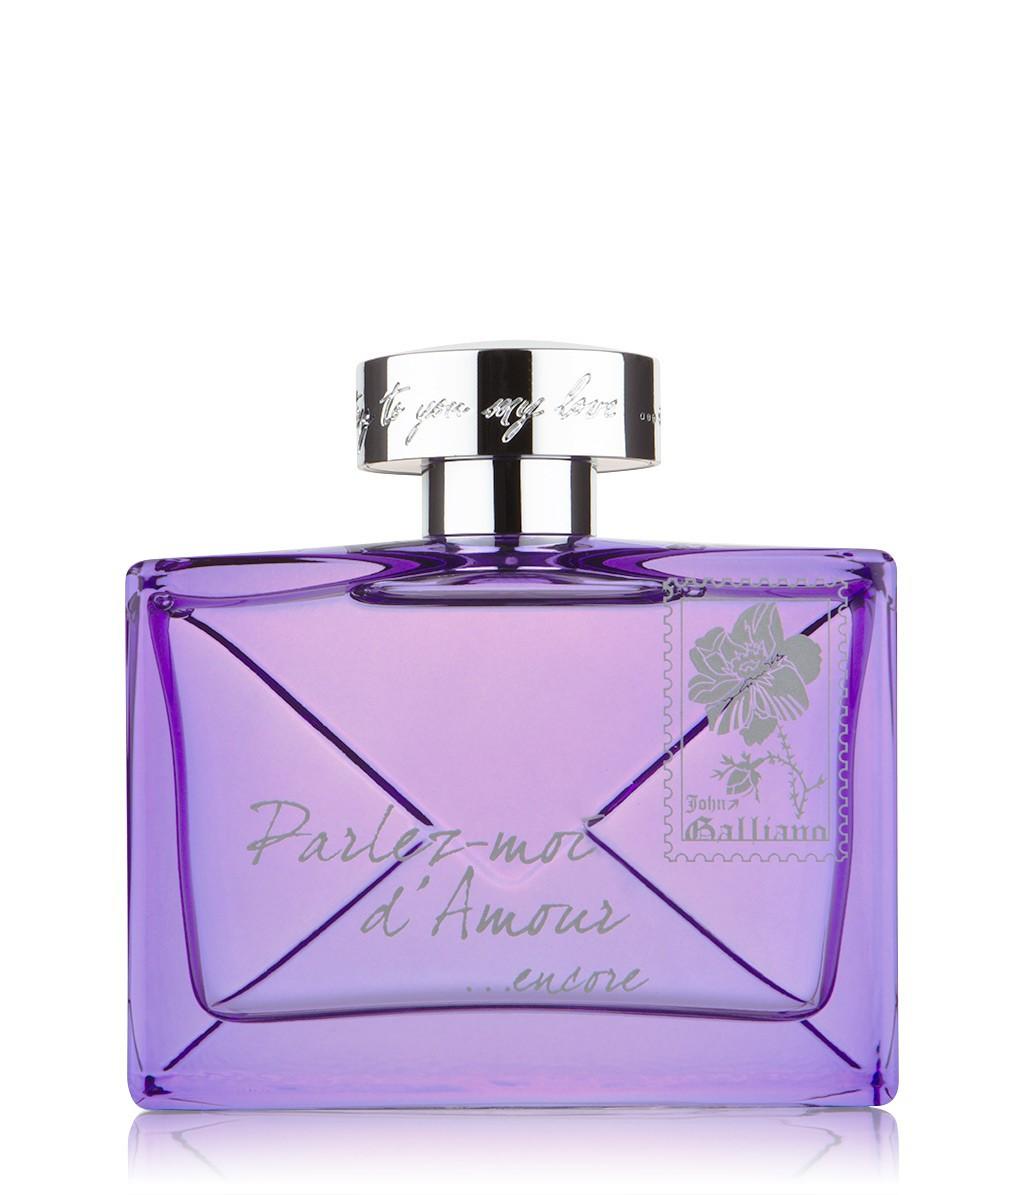 John Galliano Parlez-Moi d'Amour ...encore аромат для женщин